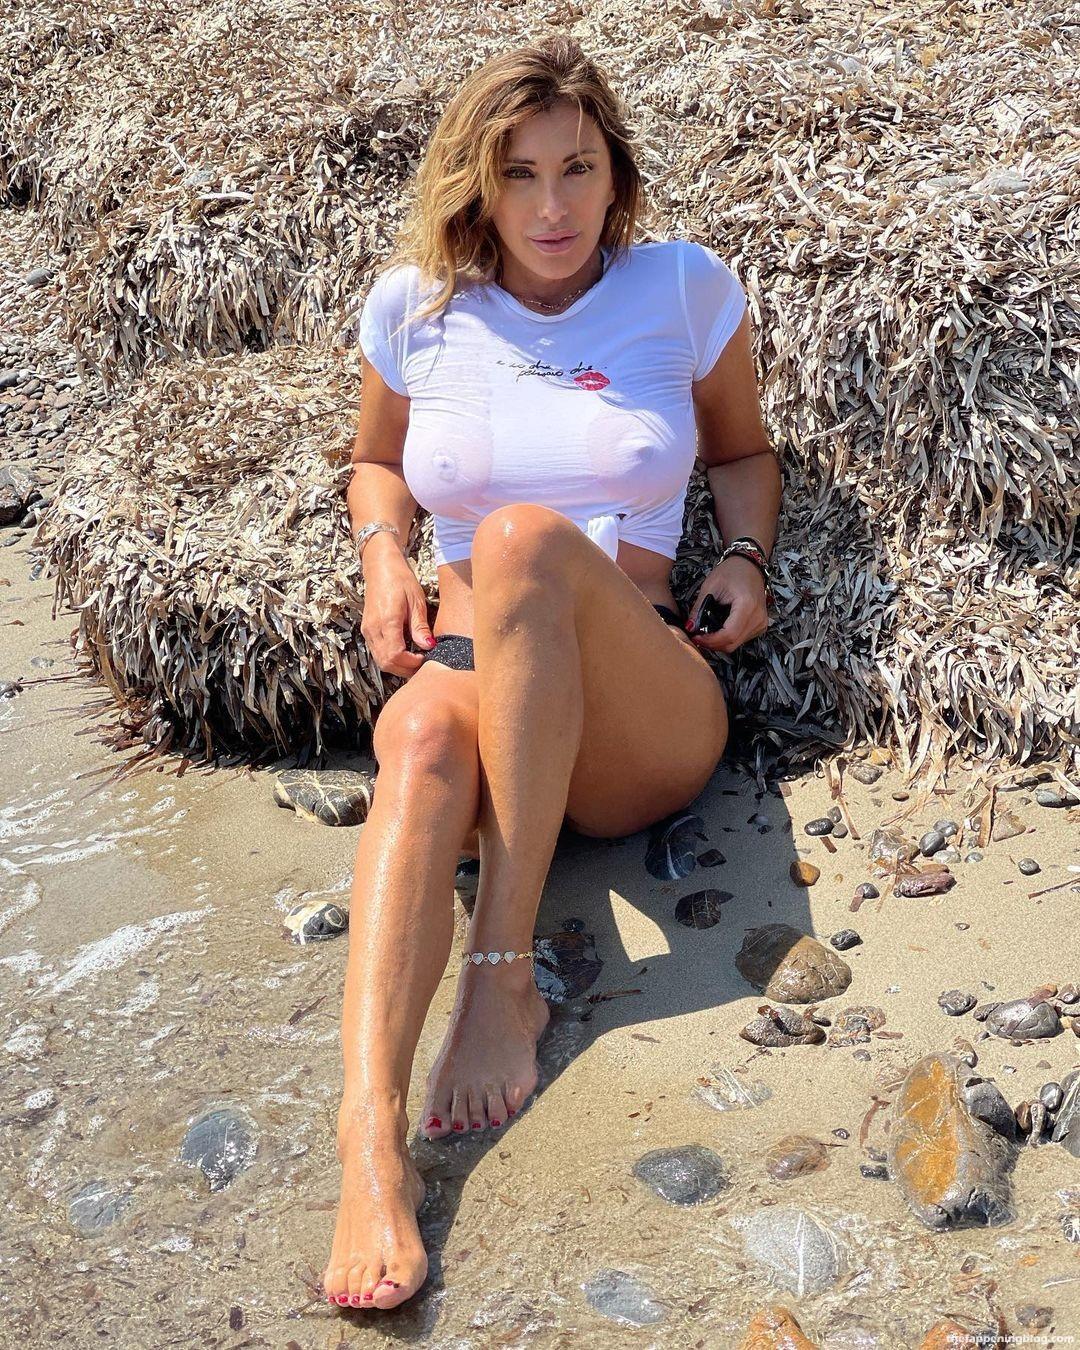 Sabrina Salerno Displays Her Nude Tits (6 Pics)